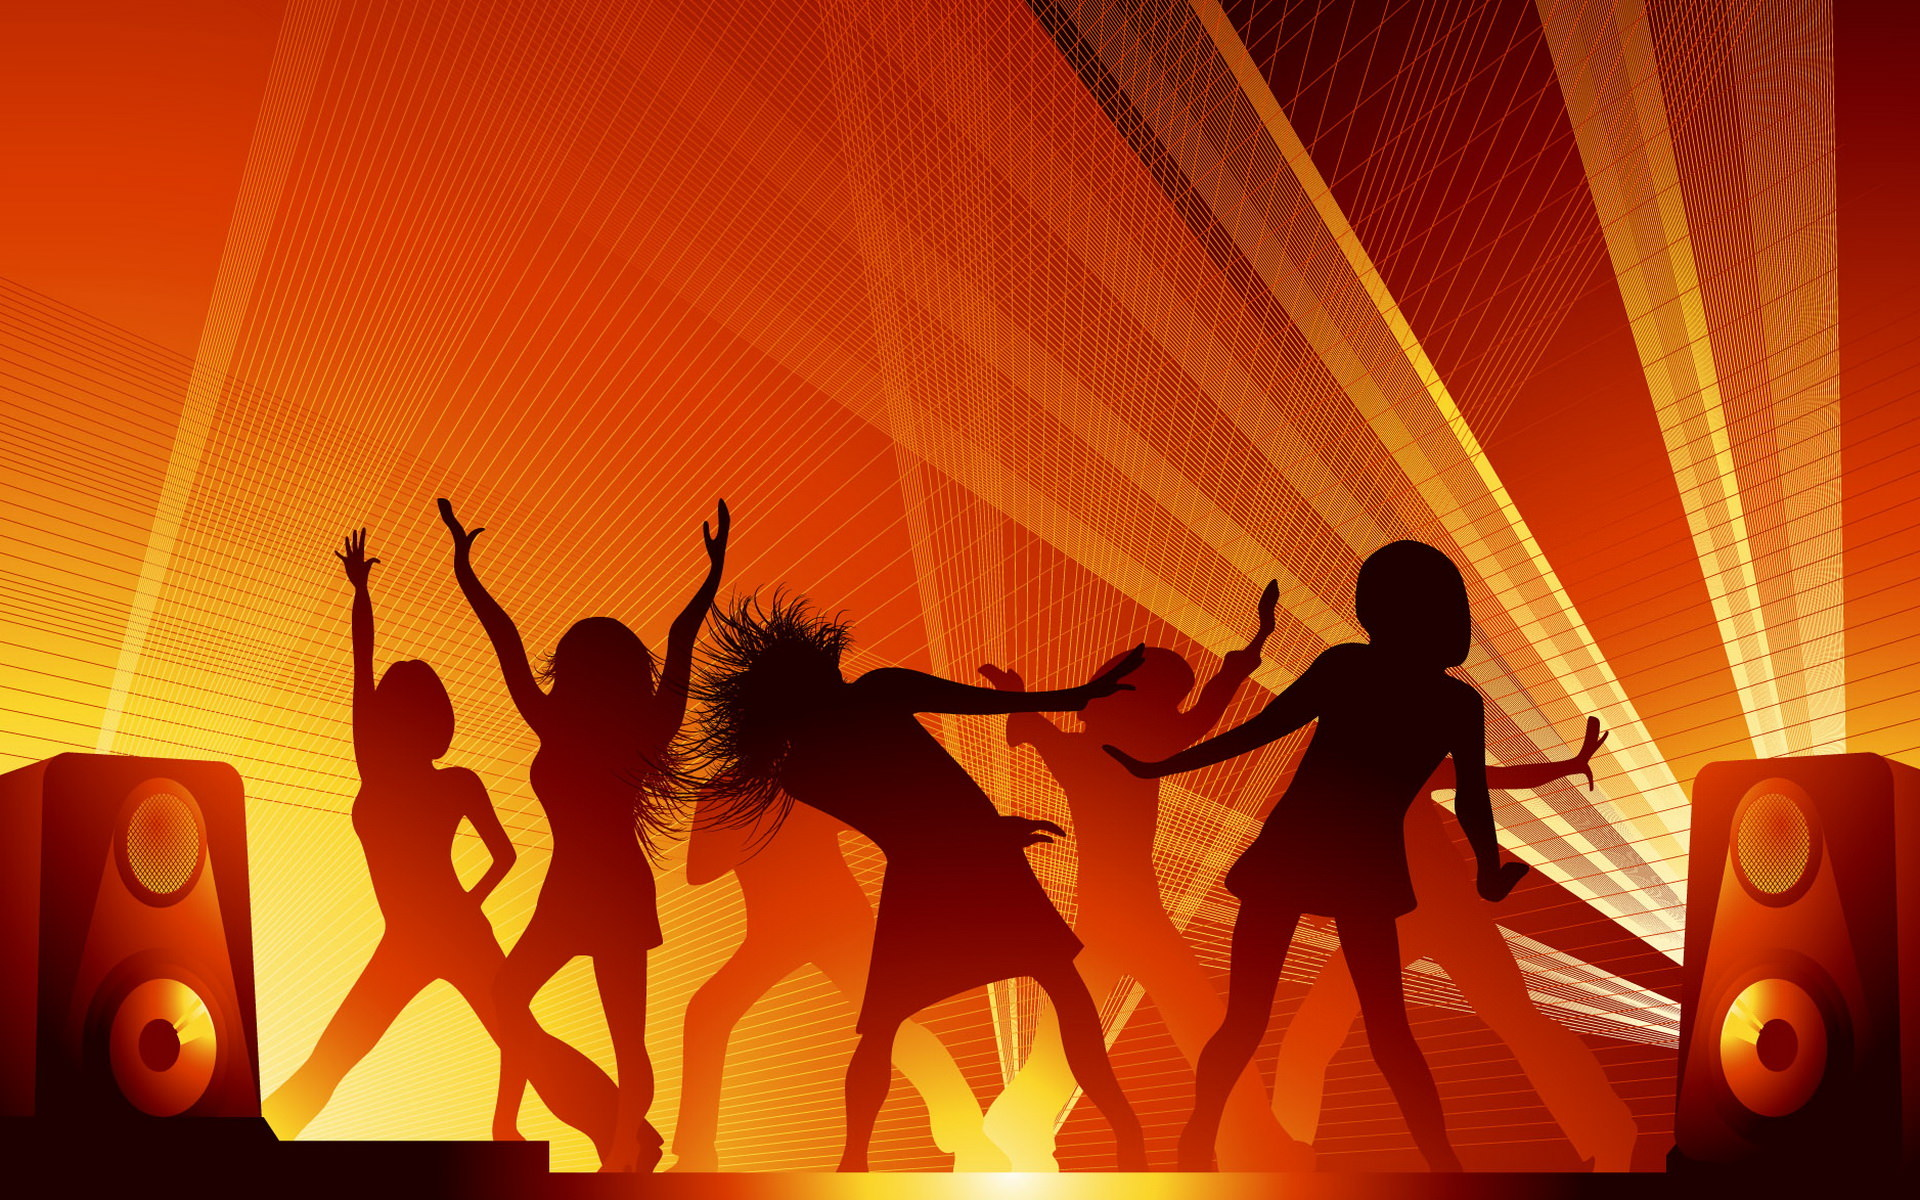 Картинка силуэты людей танцующих на танцполе обои на ...: http://fon.at.ua/photo/kartinki_ljudi/siluehty_ljudej_tancujushhikh_na_tancpole/20-0-464